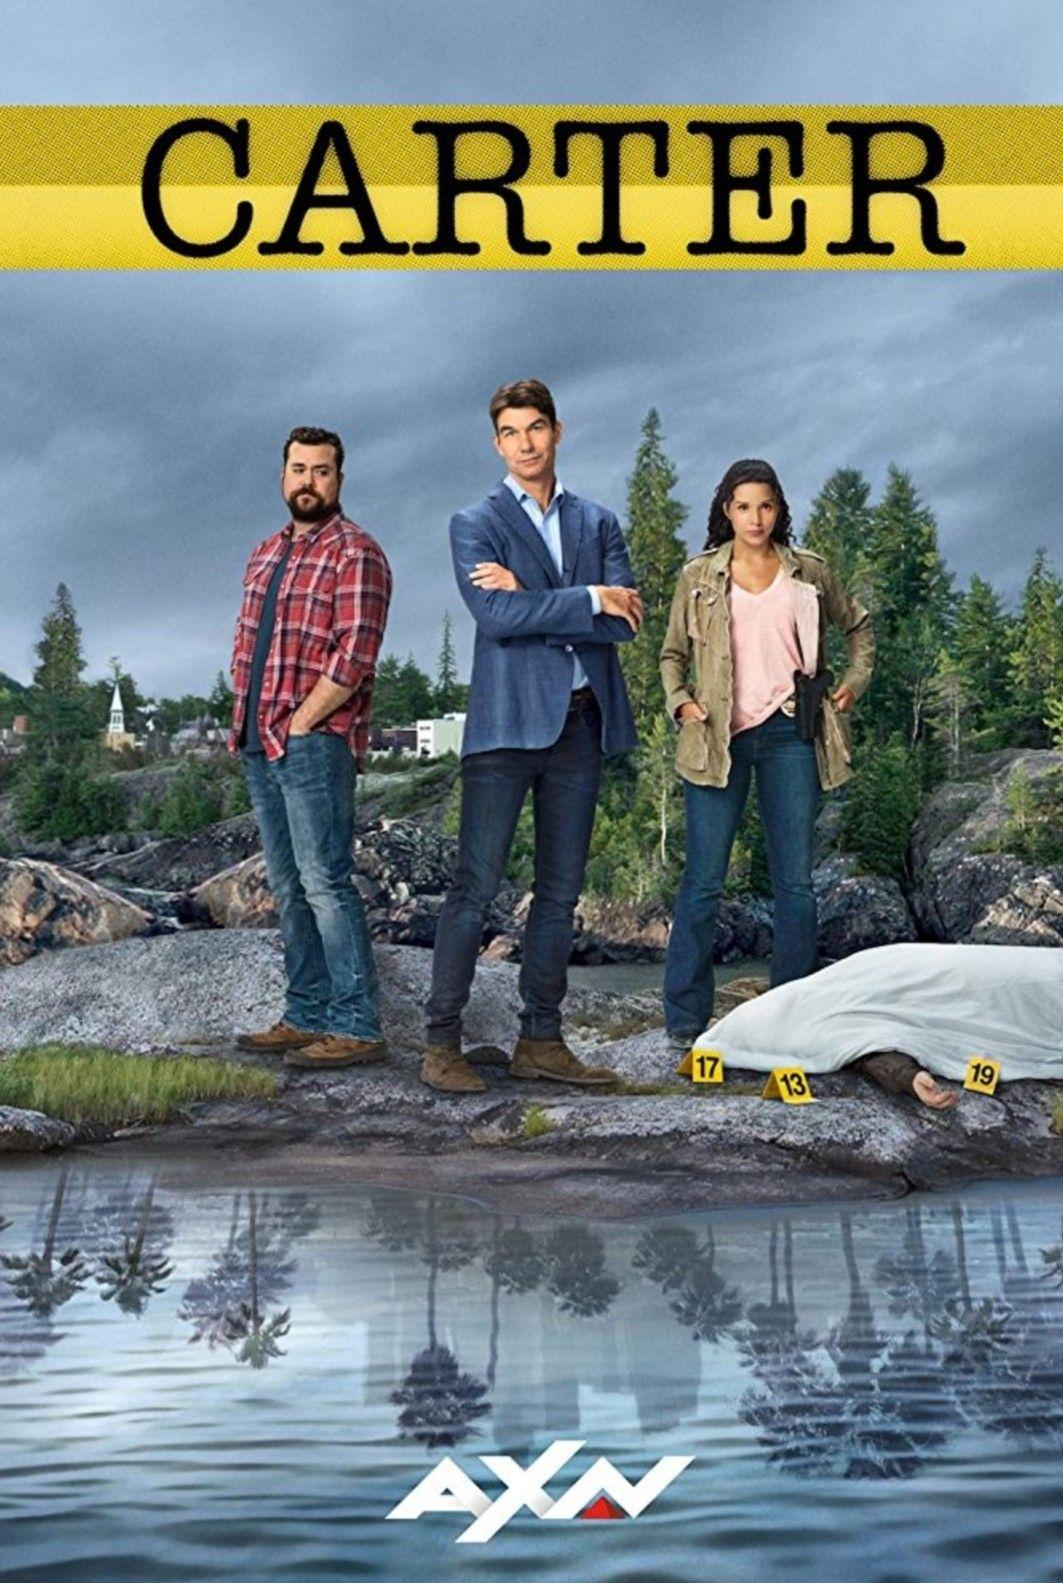 Carter | Hallmark movies | Free tv shows, Movies to watch free